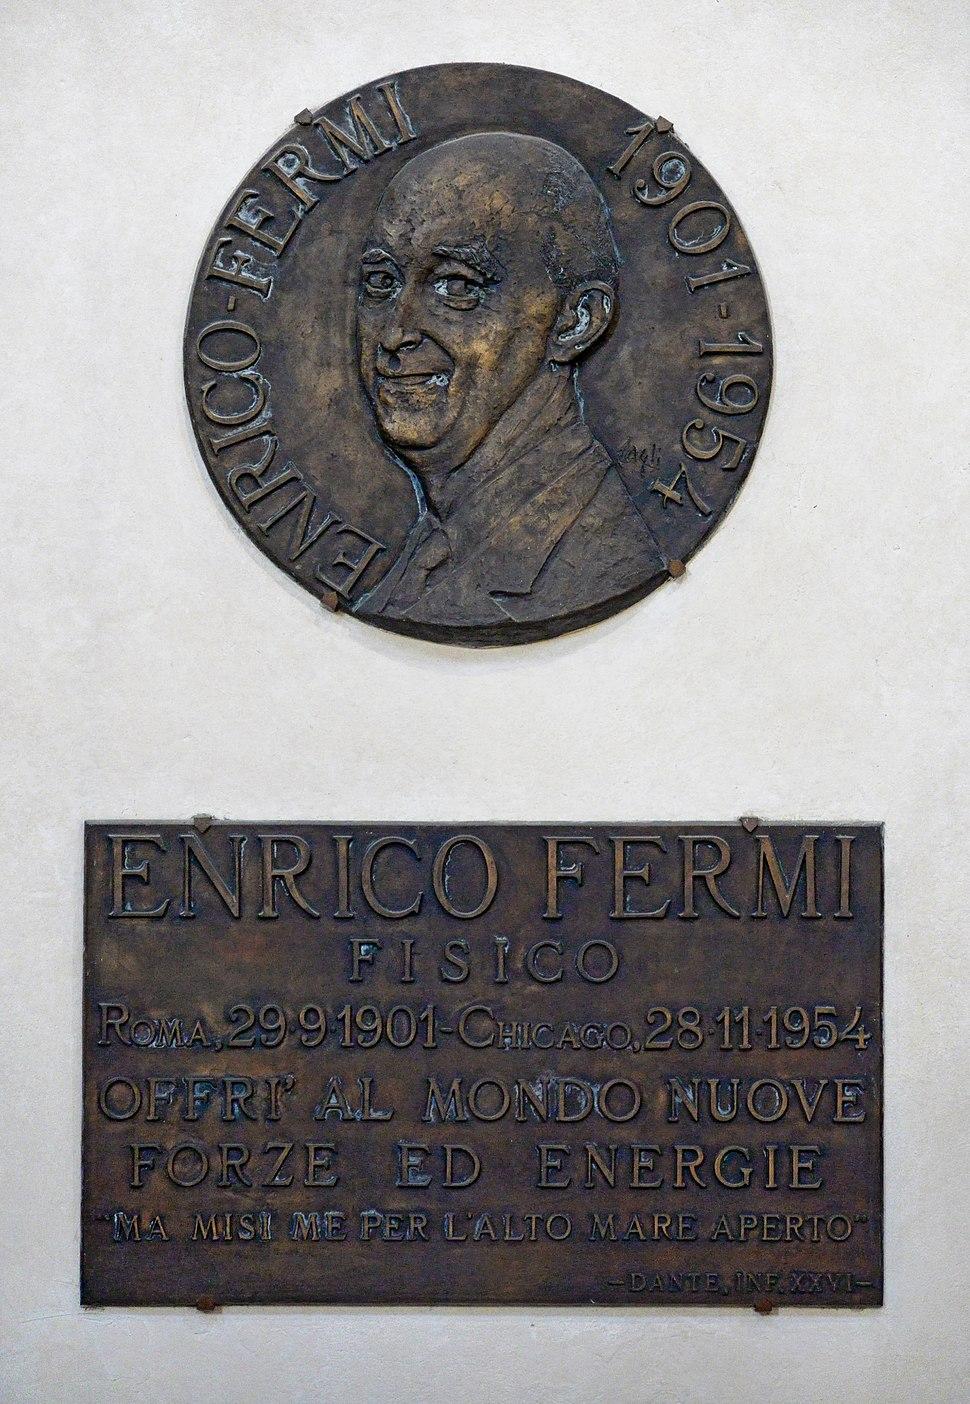 Memorial plaque in honour of Enrico Fermi in the Basilica Santa Croce, Florence. Italy